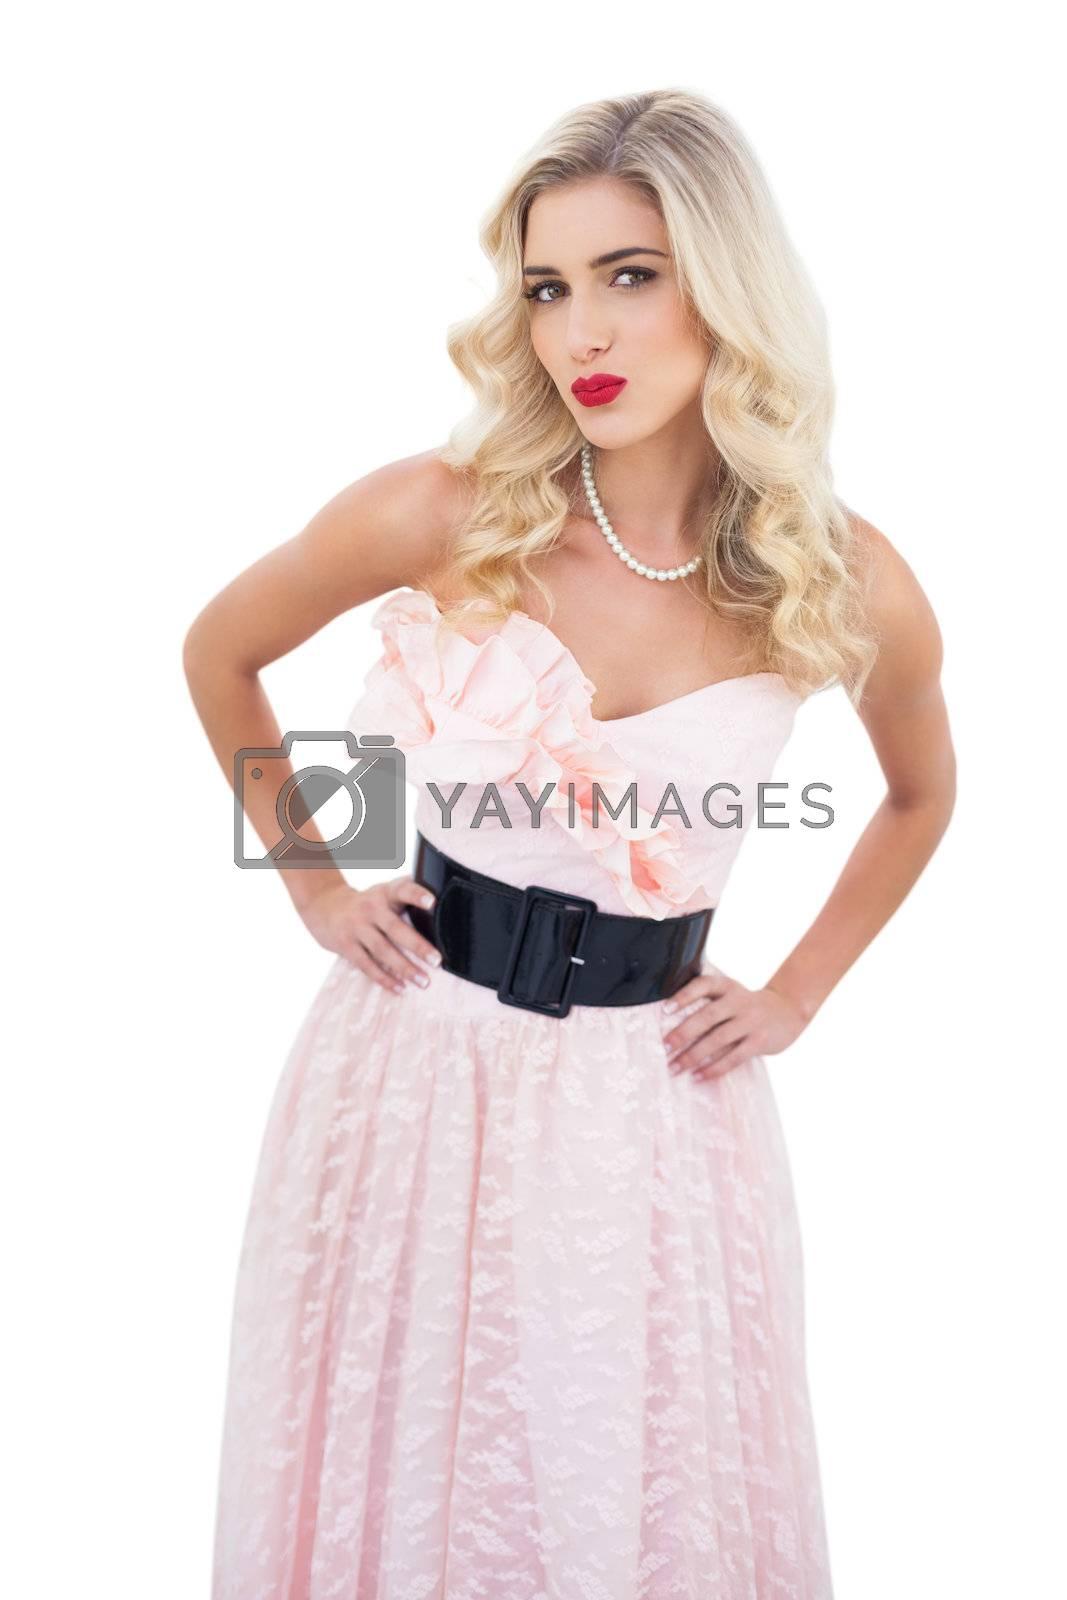 Seductive blonde model in pink dress posing hands on the hips by Wavebreakmedia